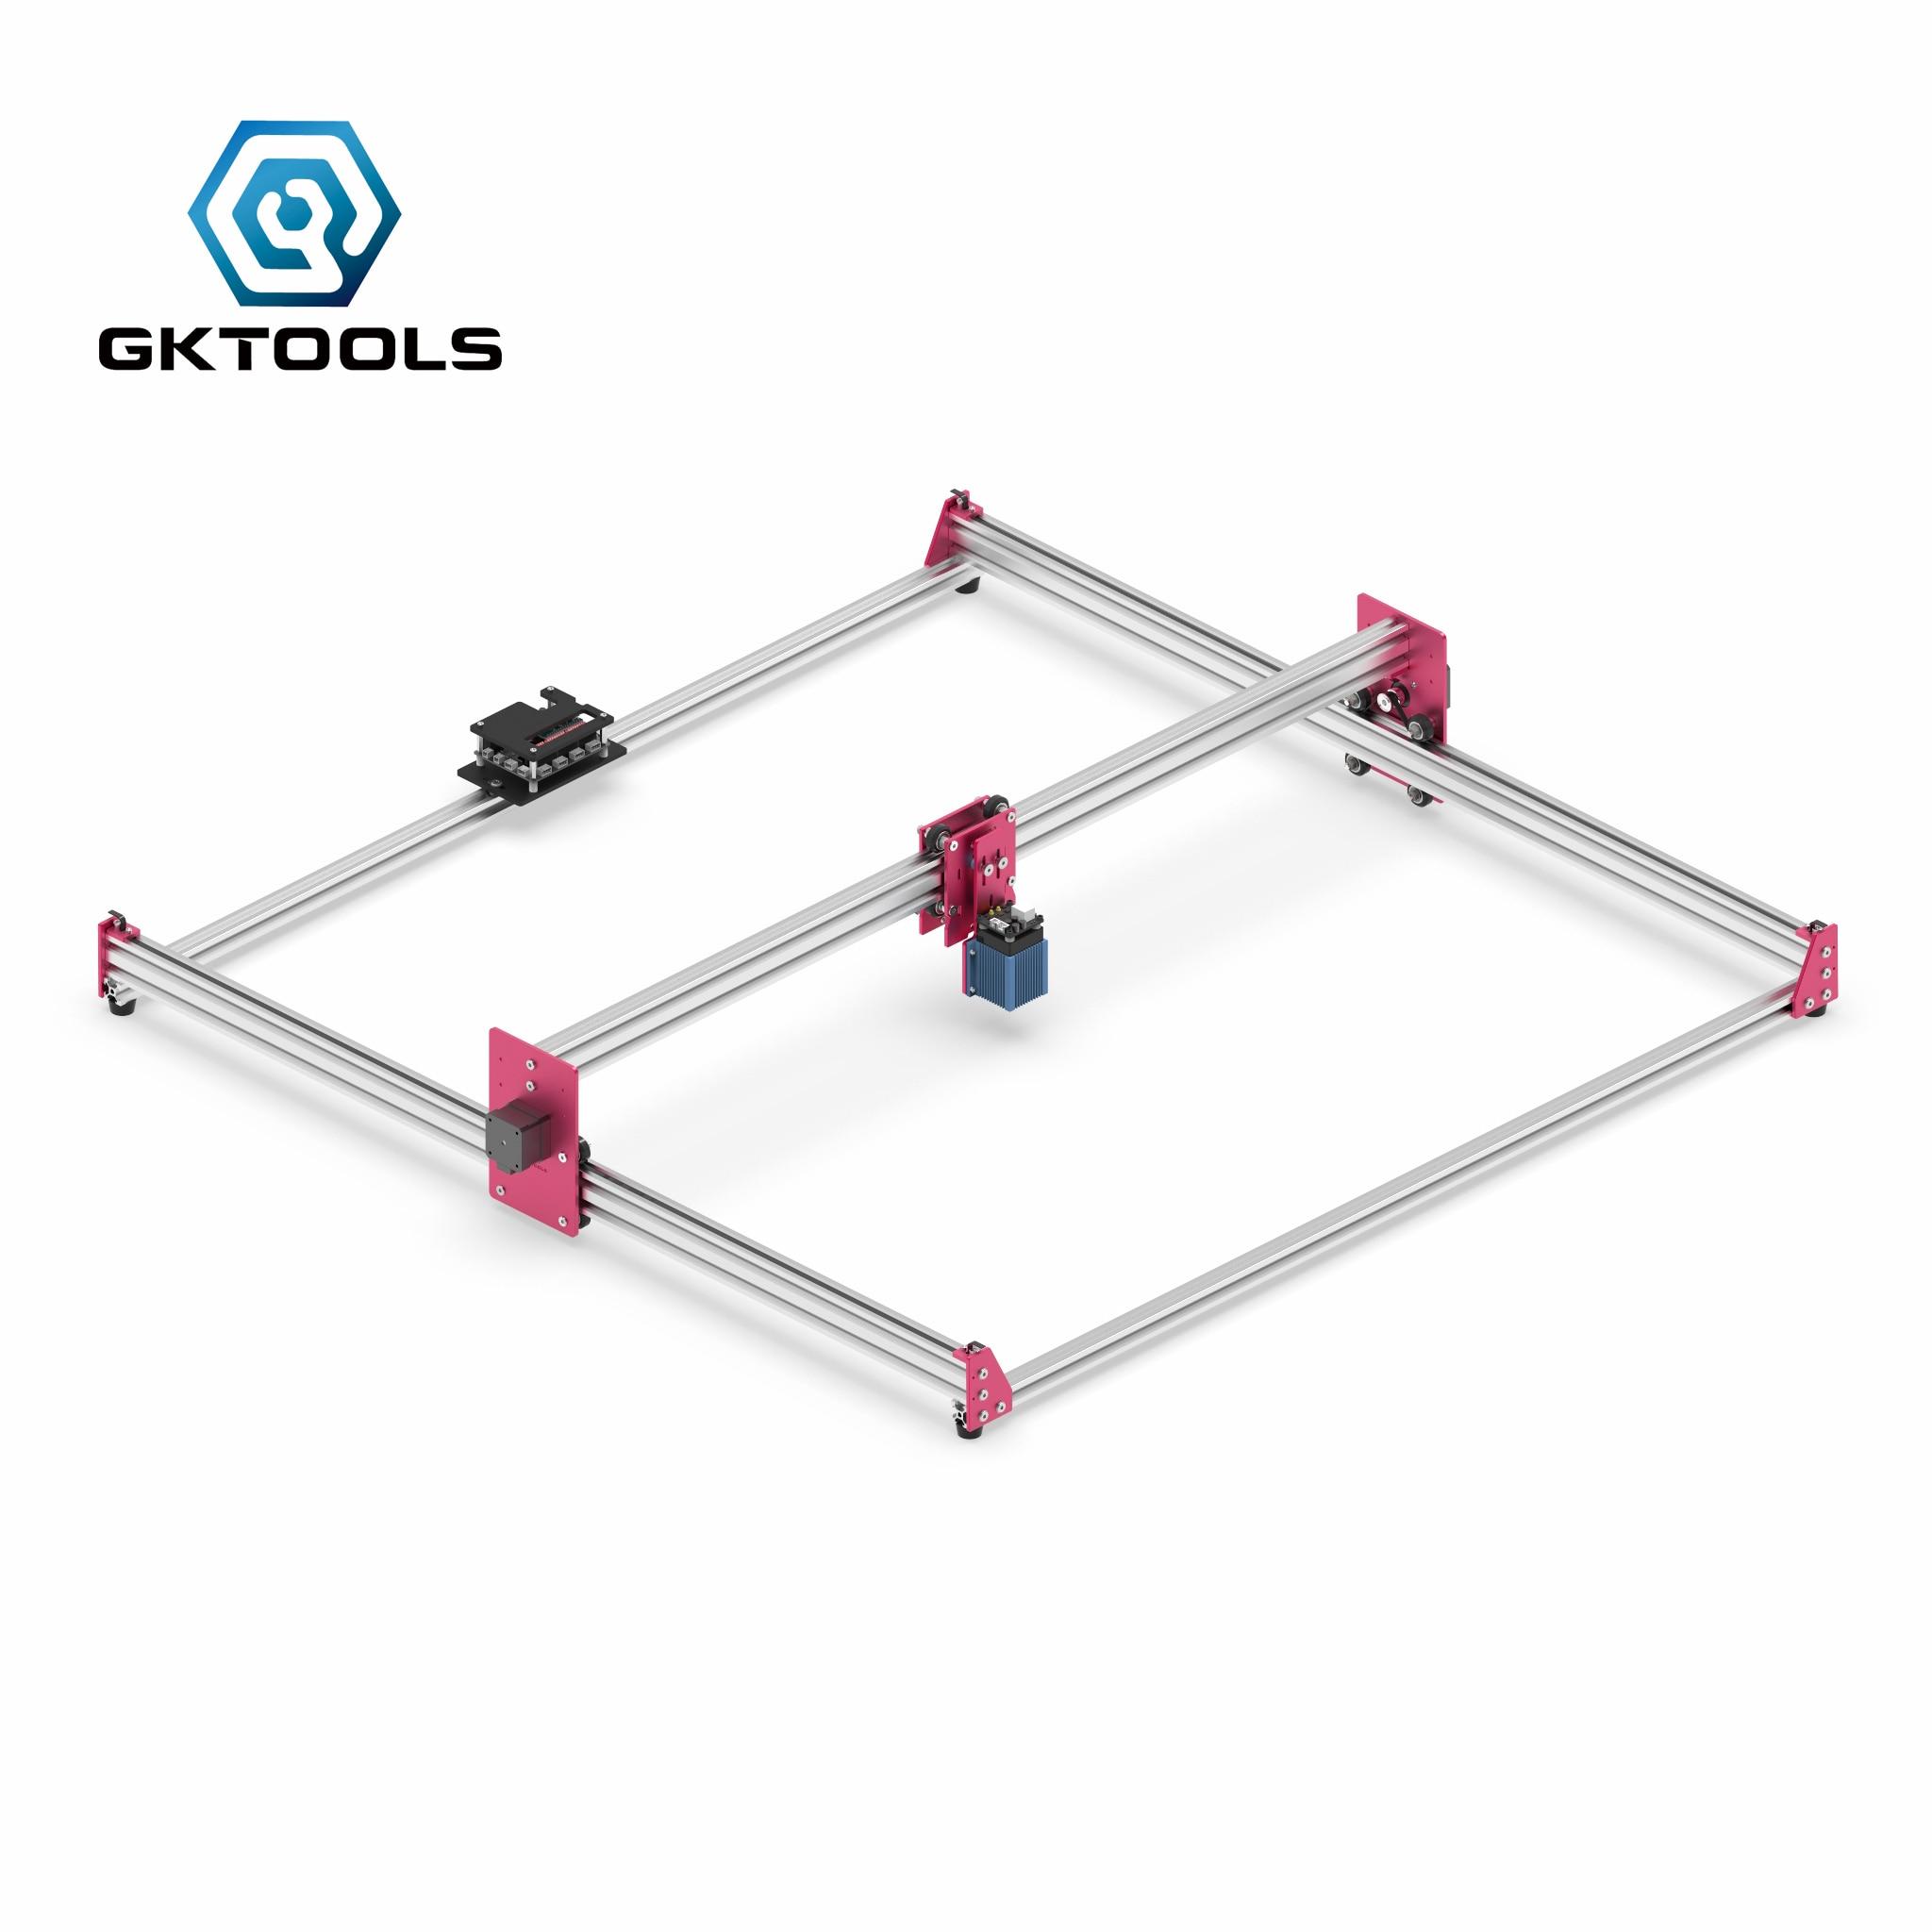 Лазерная тяга гравировка Бесплатная доставка GK1010Pro 100*100 см мини 500/2500/5500/7500 МВт cnc машина